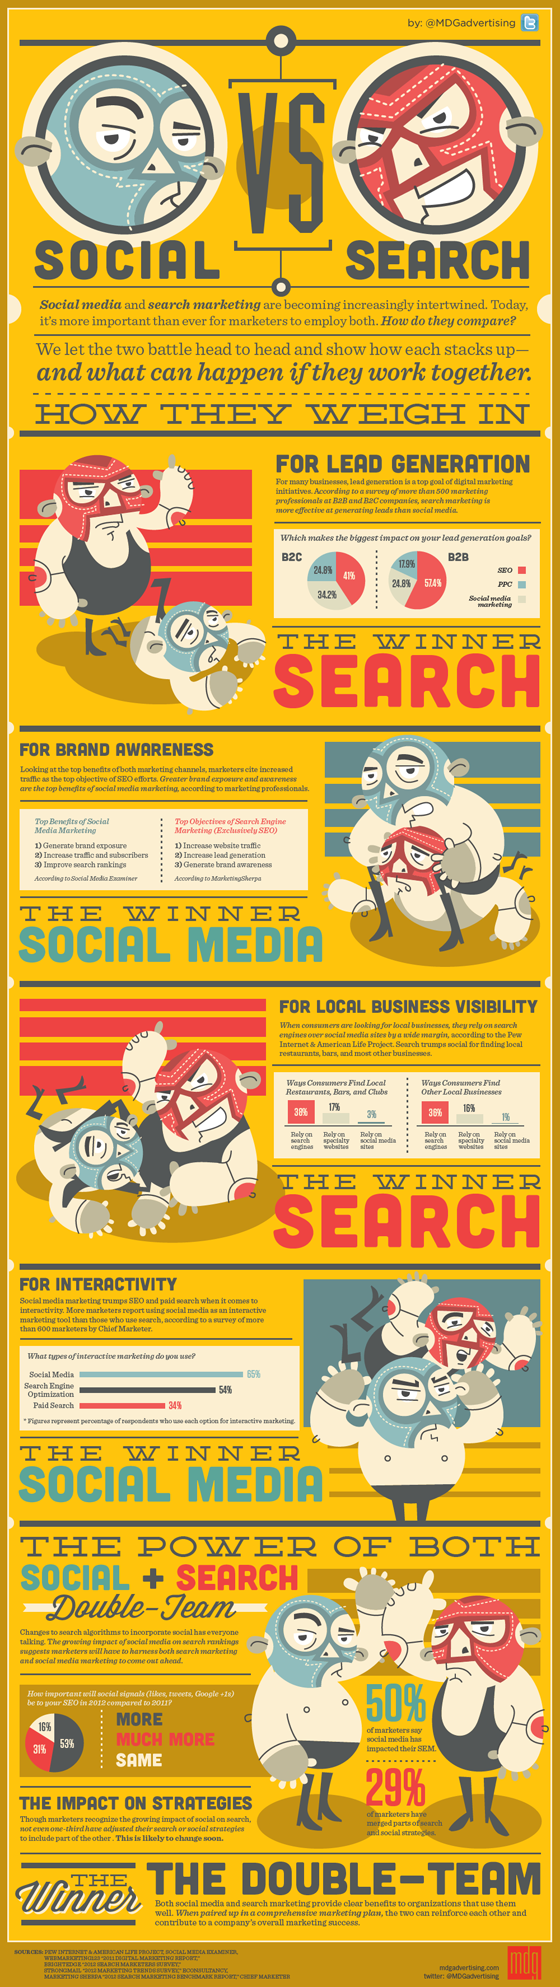 Social vs Search Smackdown, Battle of Internet Marketing Giants